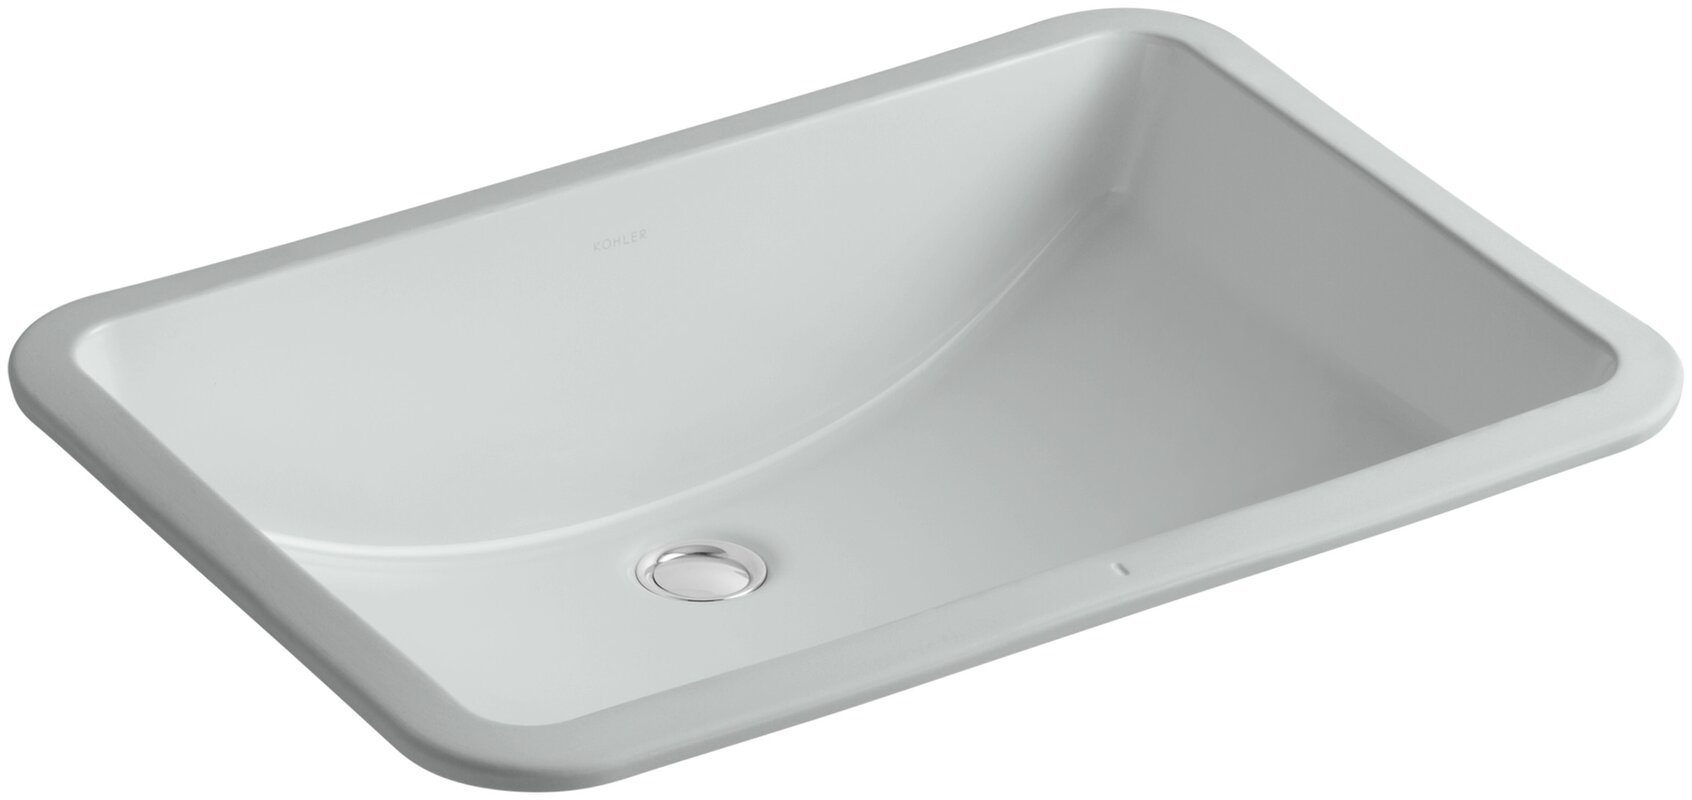 Kohler Ladena Rectangular Undermount Bathroom Sink With Overflow Reviews